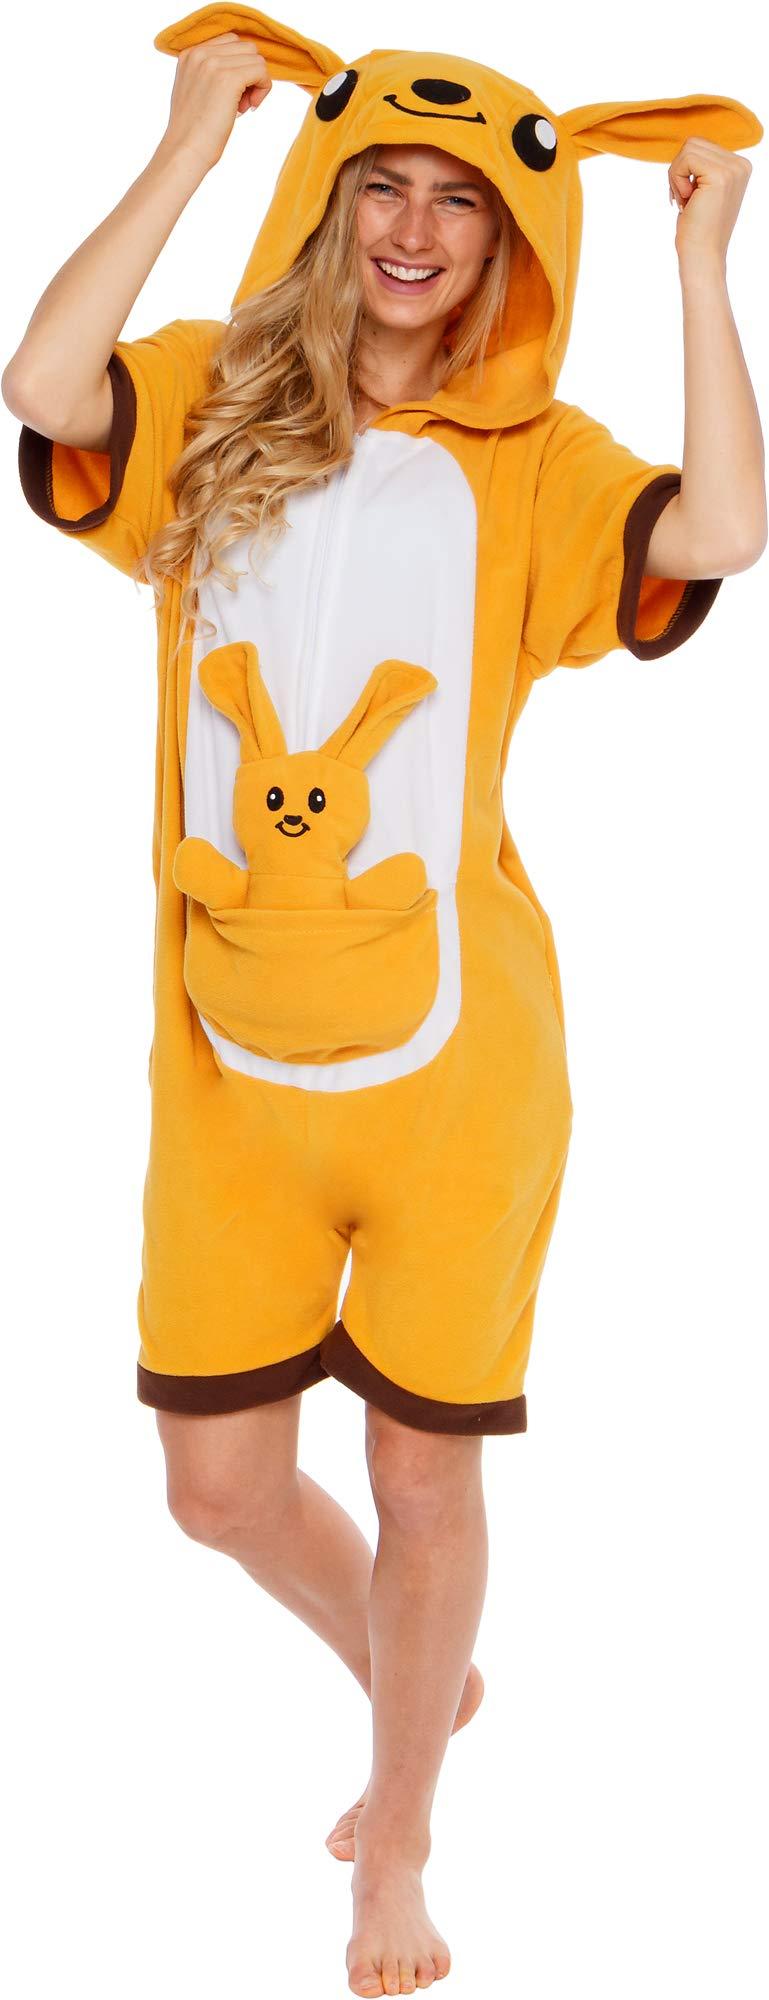 Silver Lilly Kangaroo Short Sleeve Animal Pajamas - Plush Adult One Piece Summer Cosplay Costume